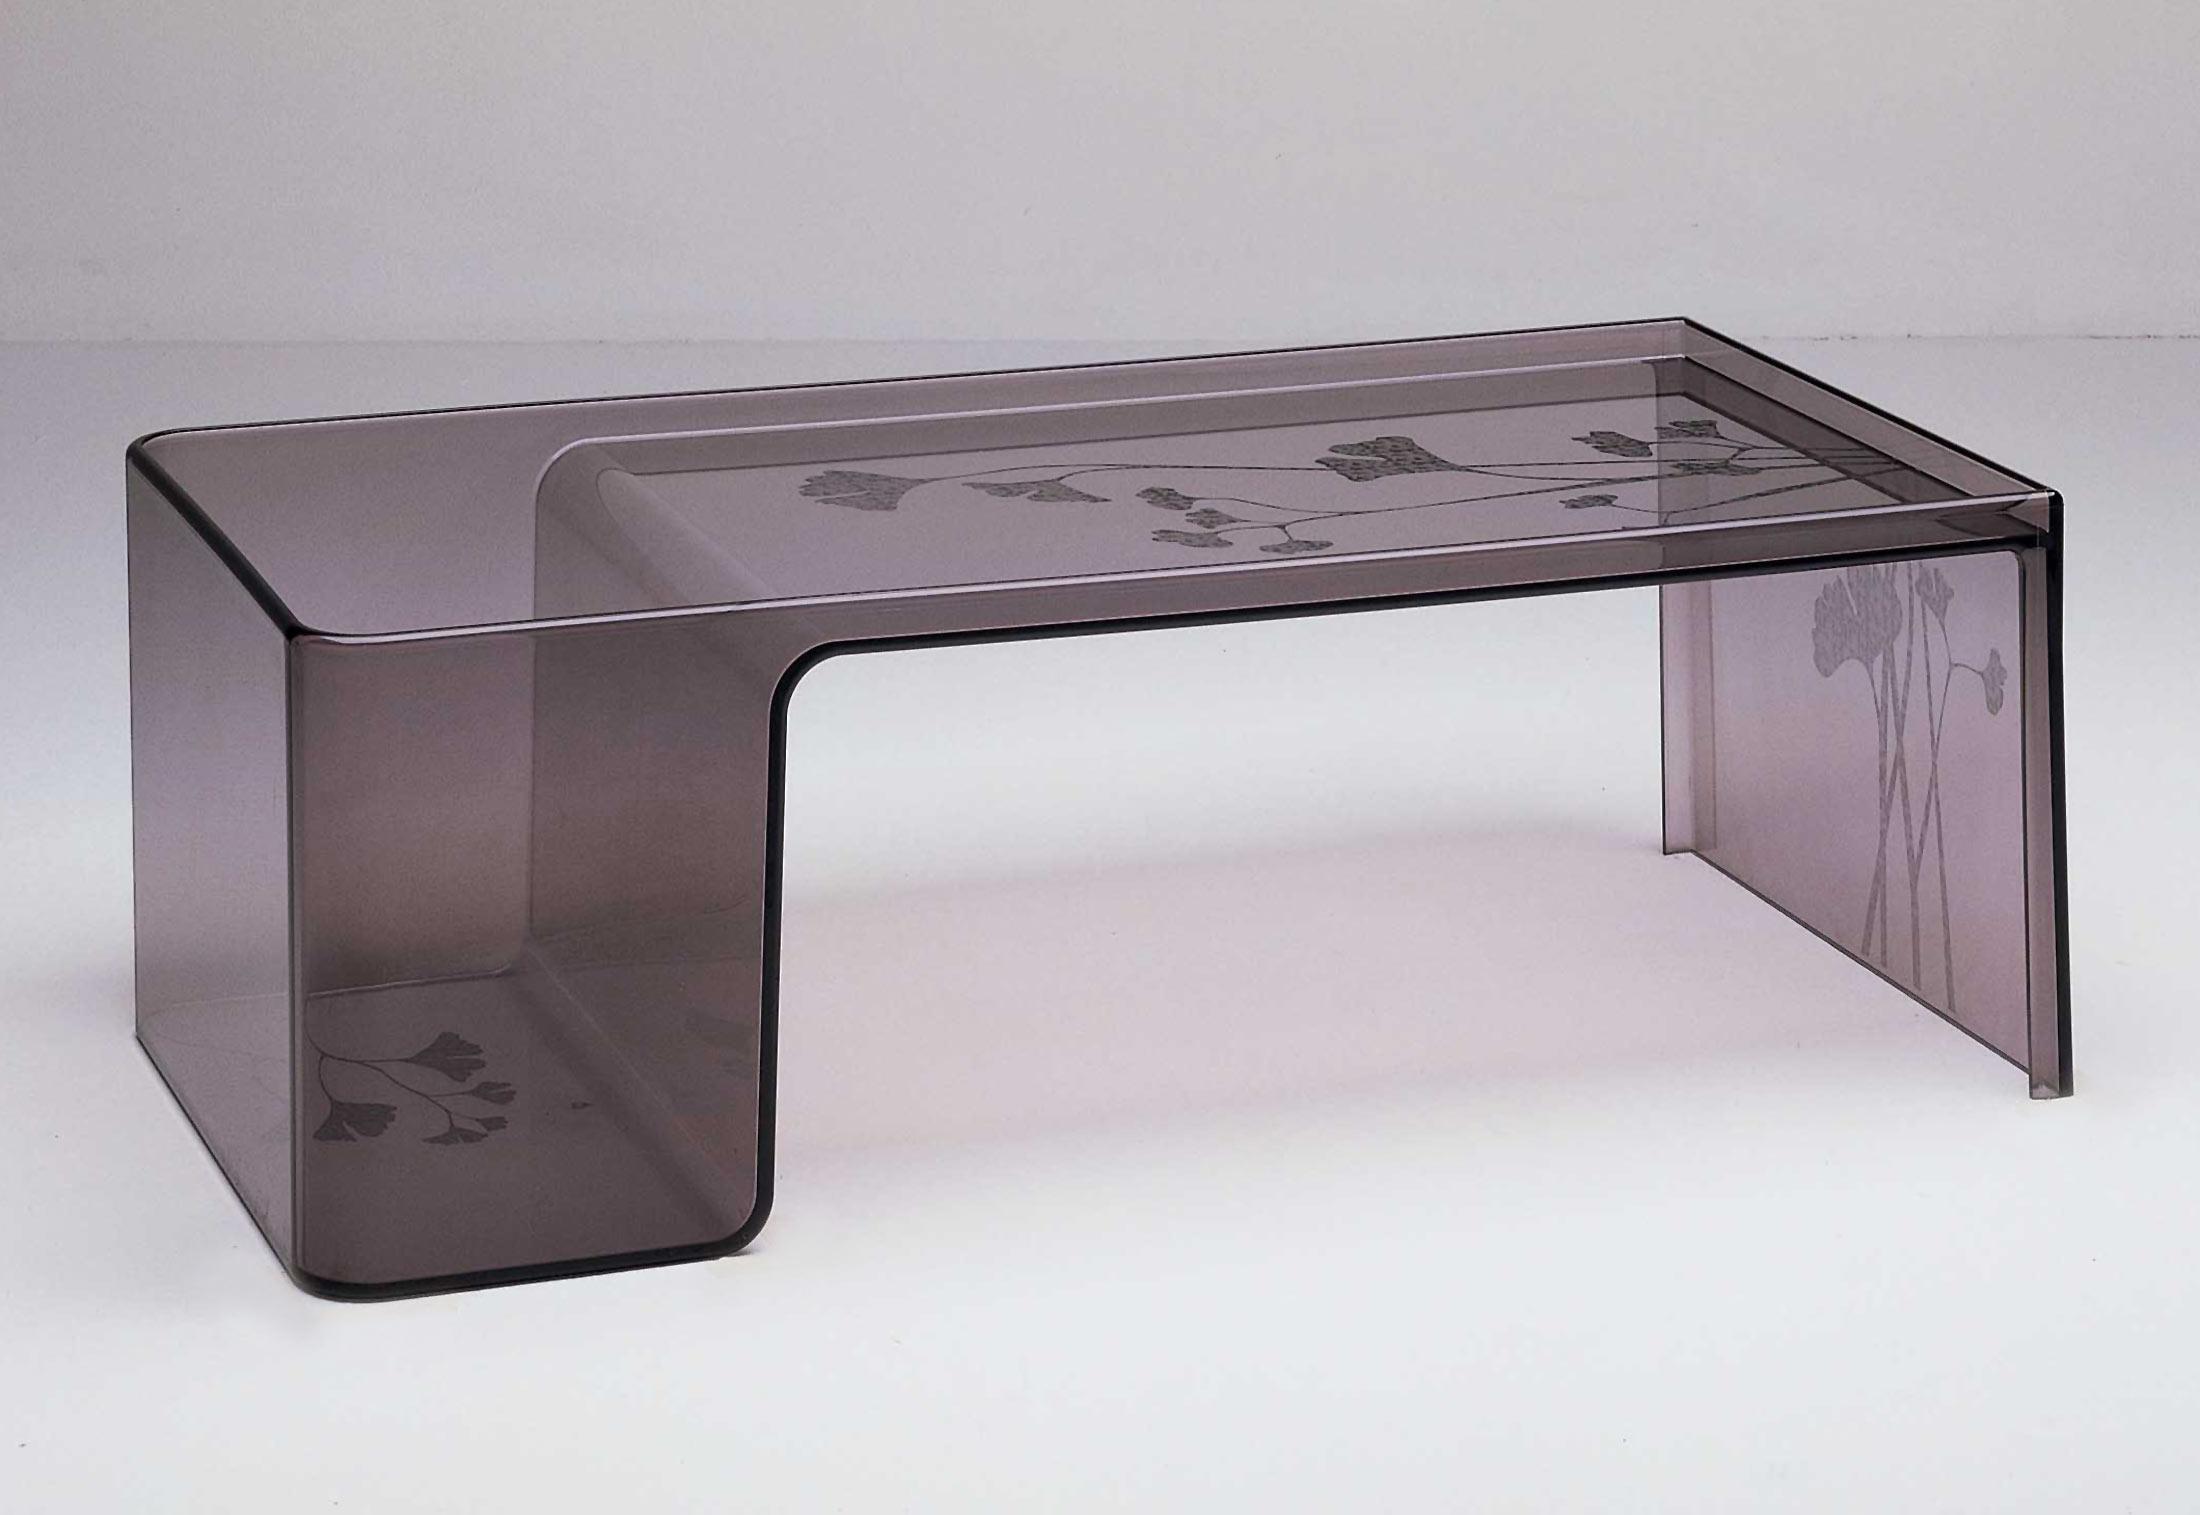 Kartell Tavolino Usame.Kartell Usame Side Table Rascalartsnyc